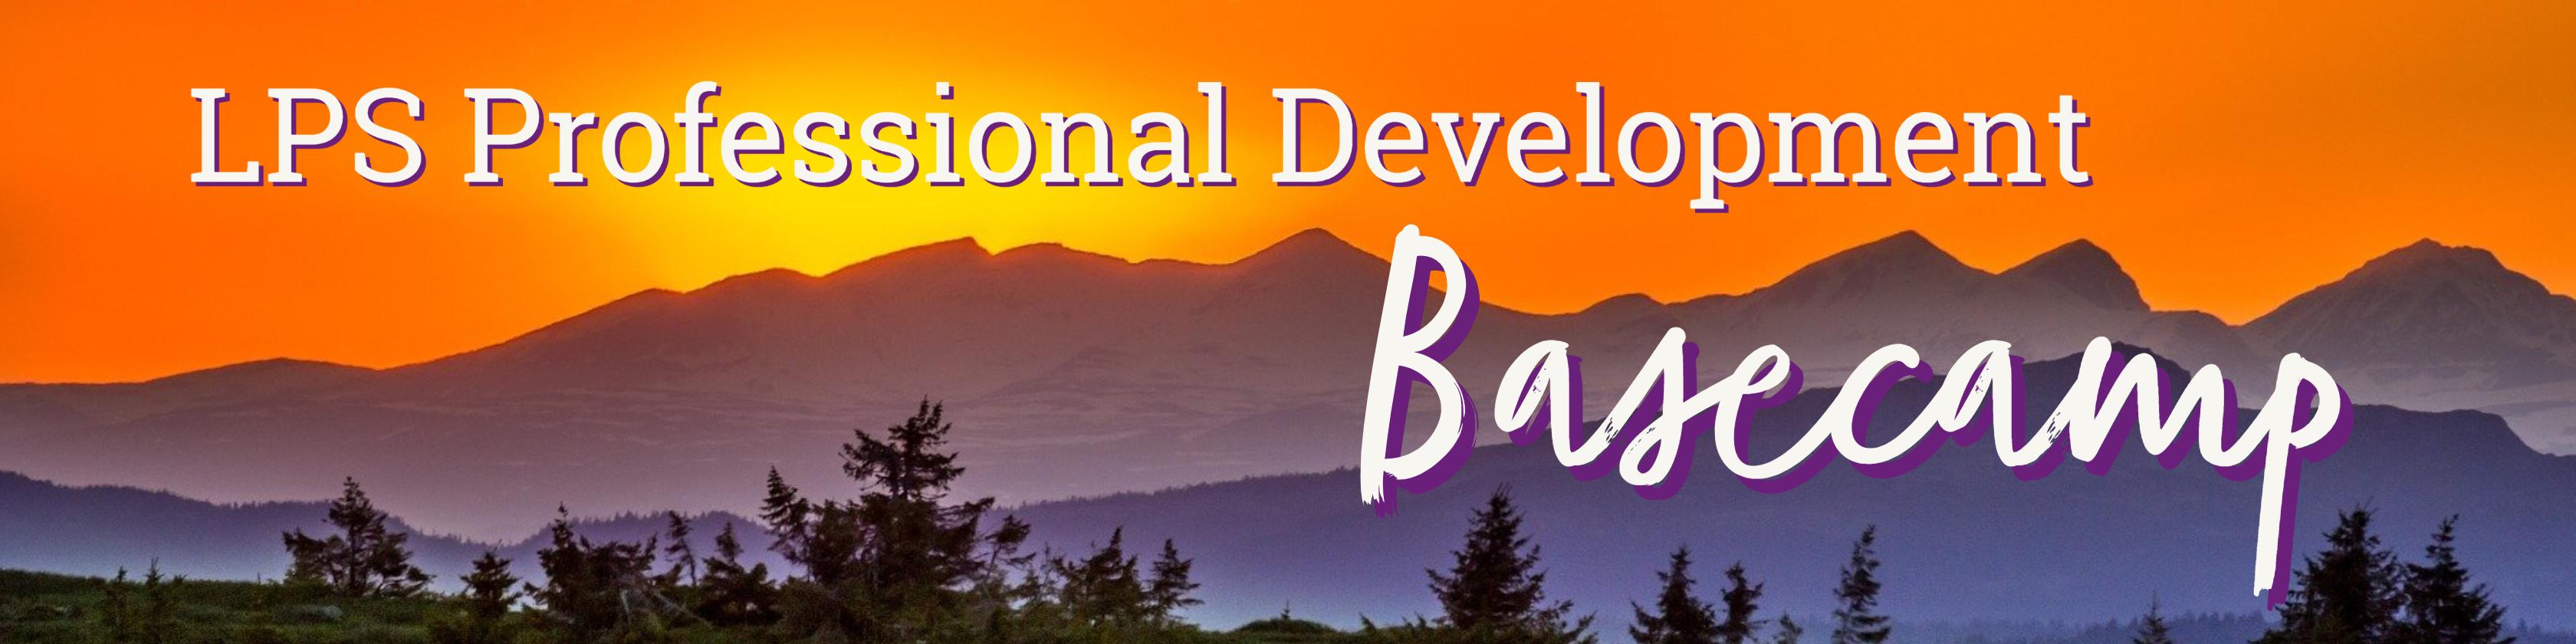 Professional Development Basecamp Header